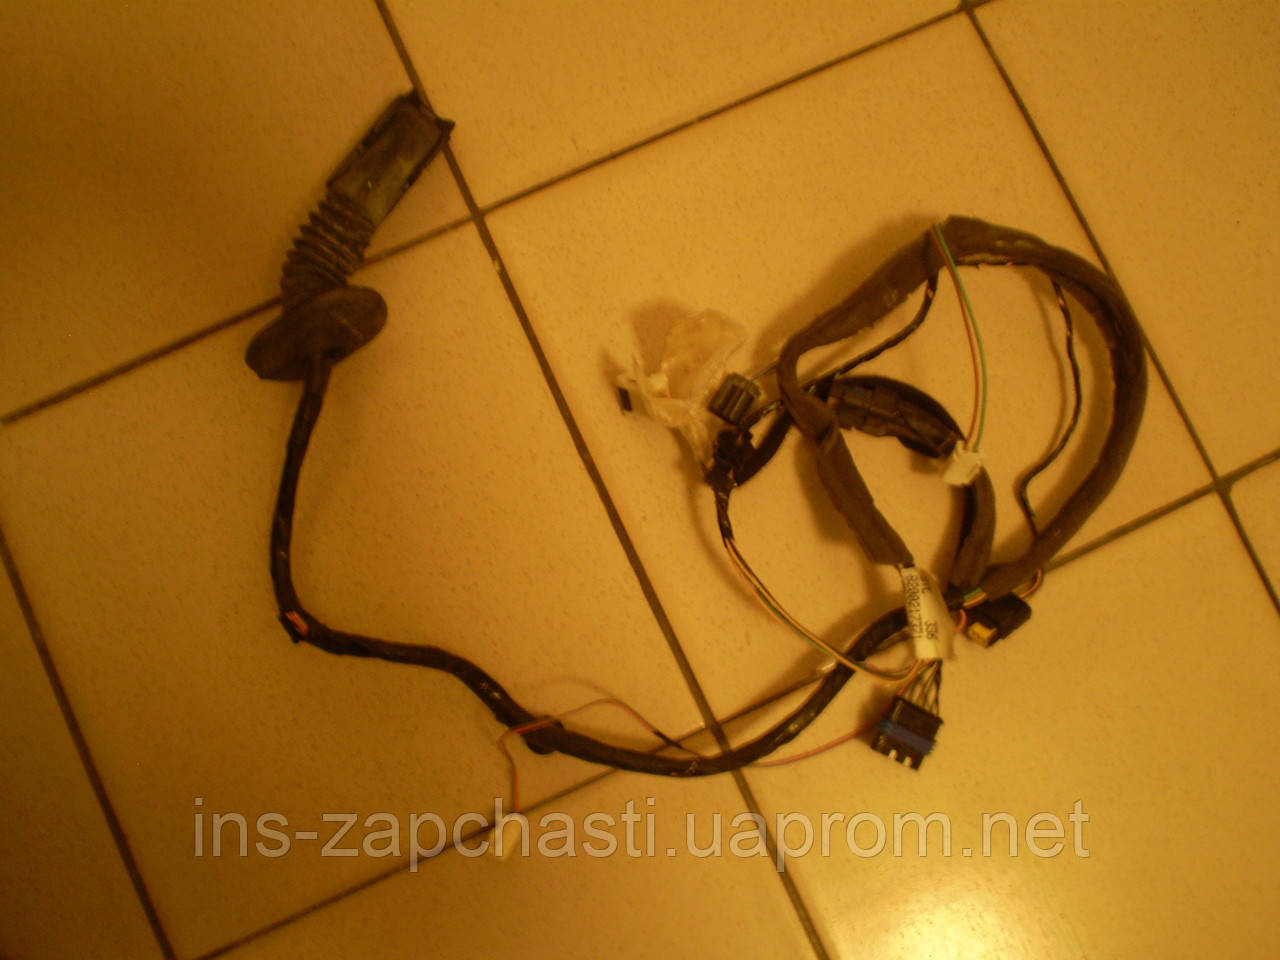 Електрична проводка у двері Renault Megan 2 2002-2009 Джгут проводів 8200164969